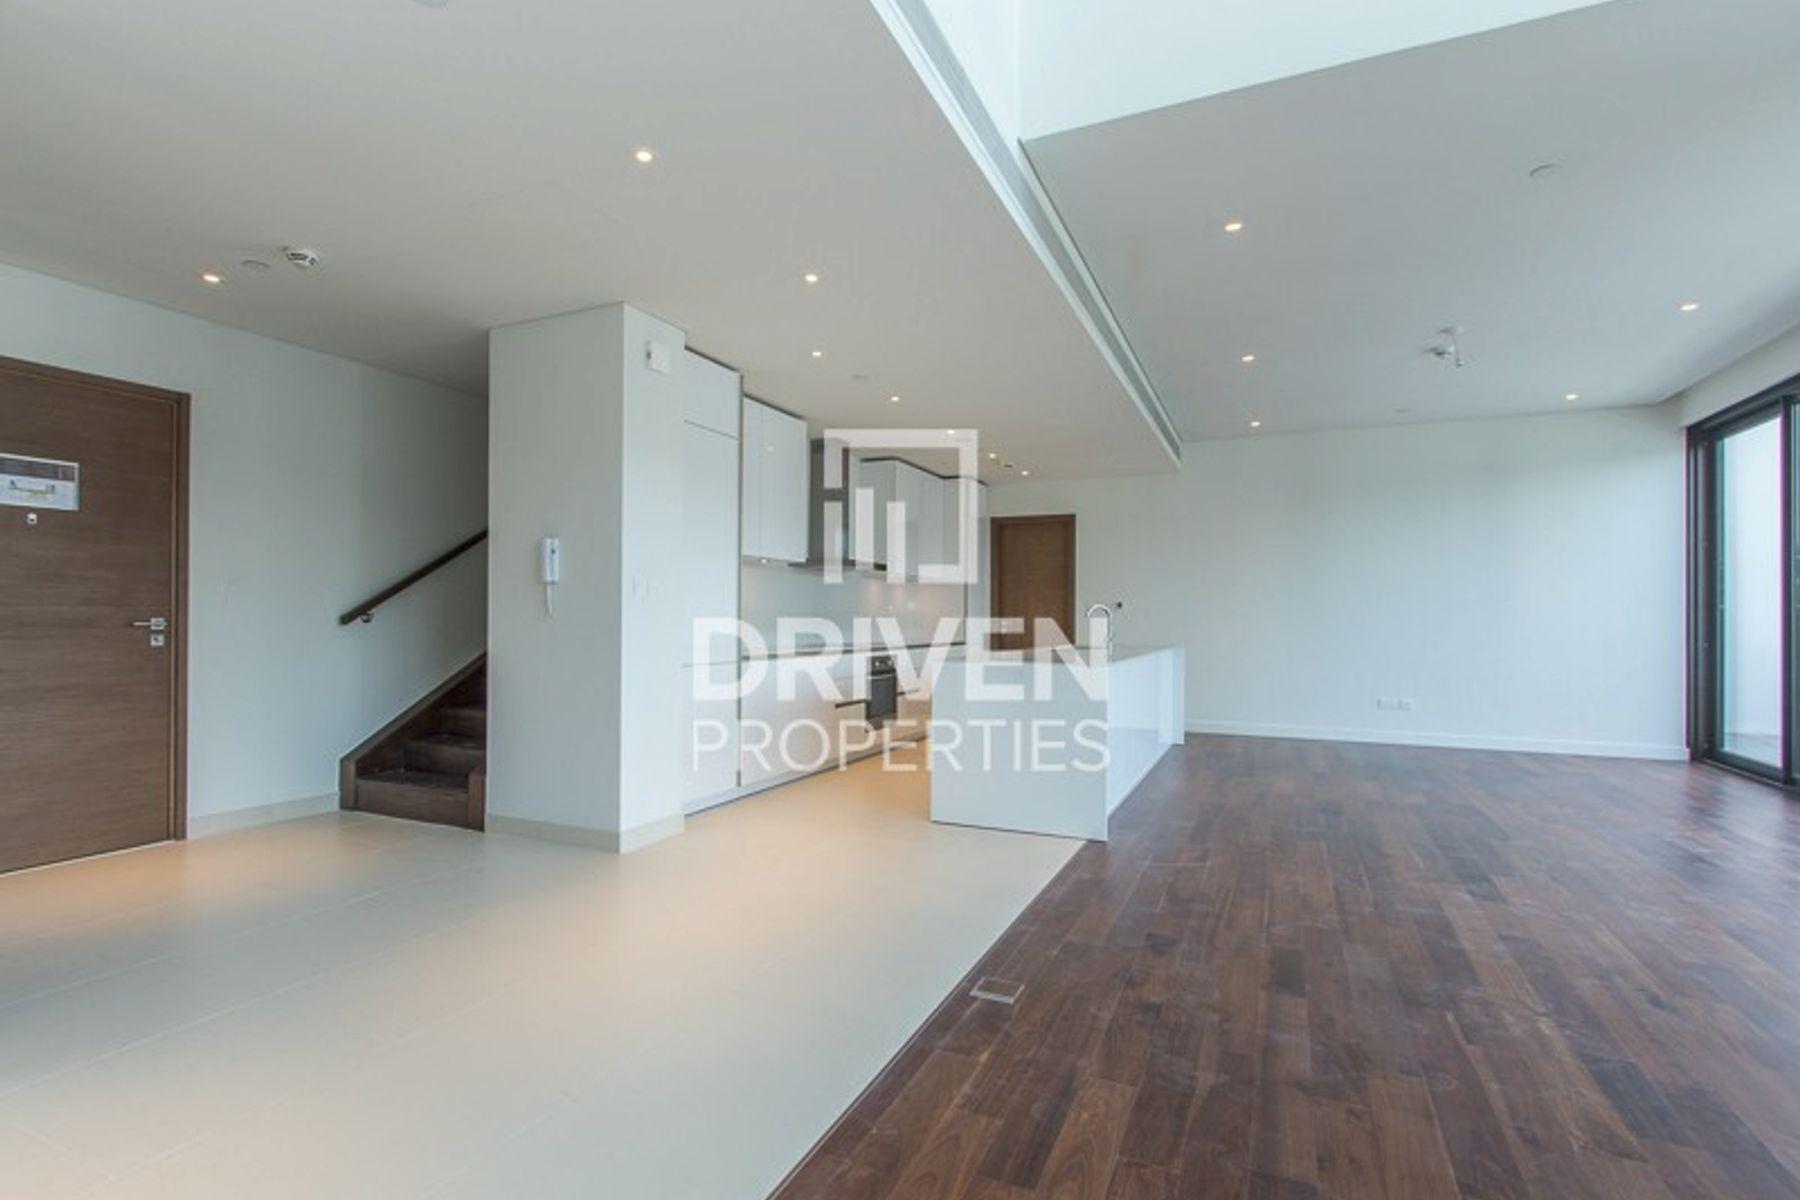 For Sale 4Bedroom Duplex Unit, City Walk